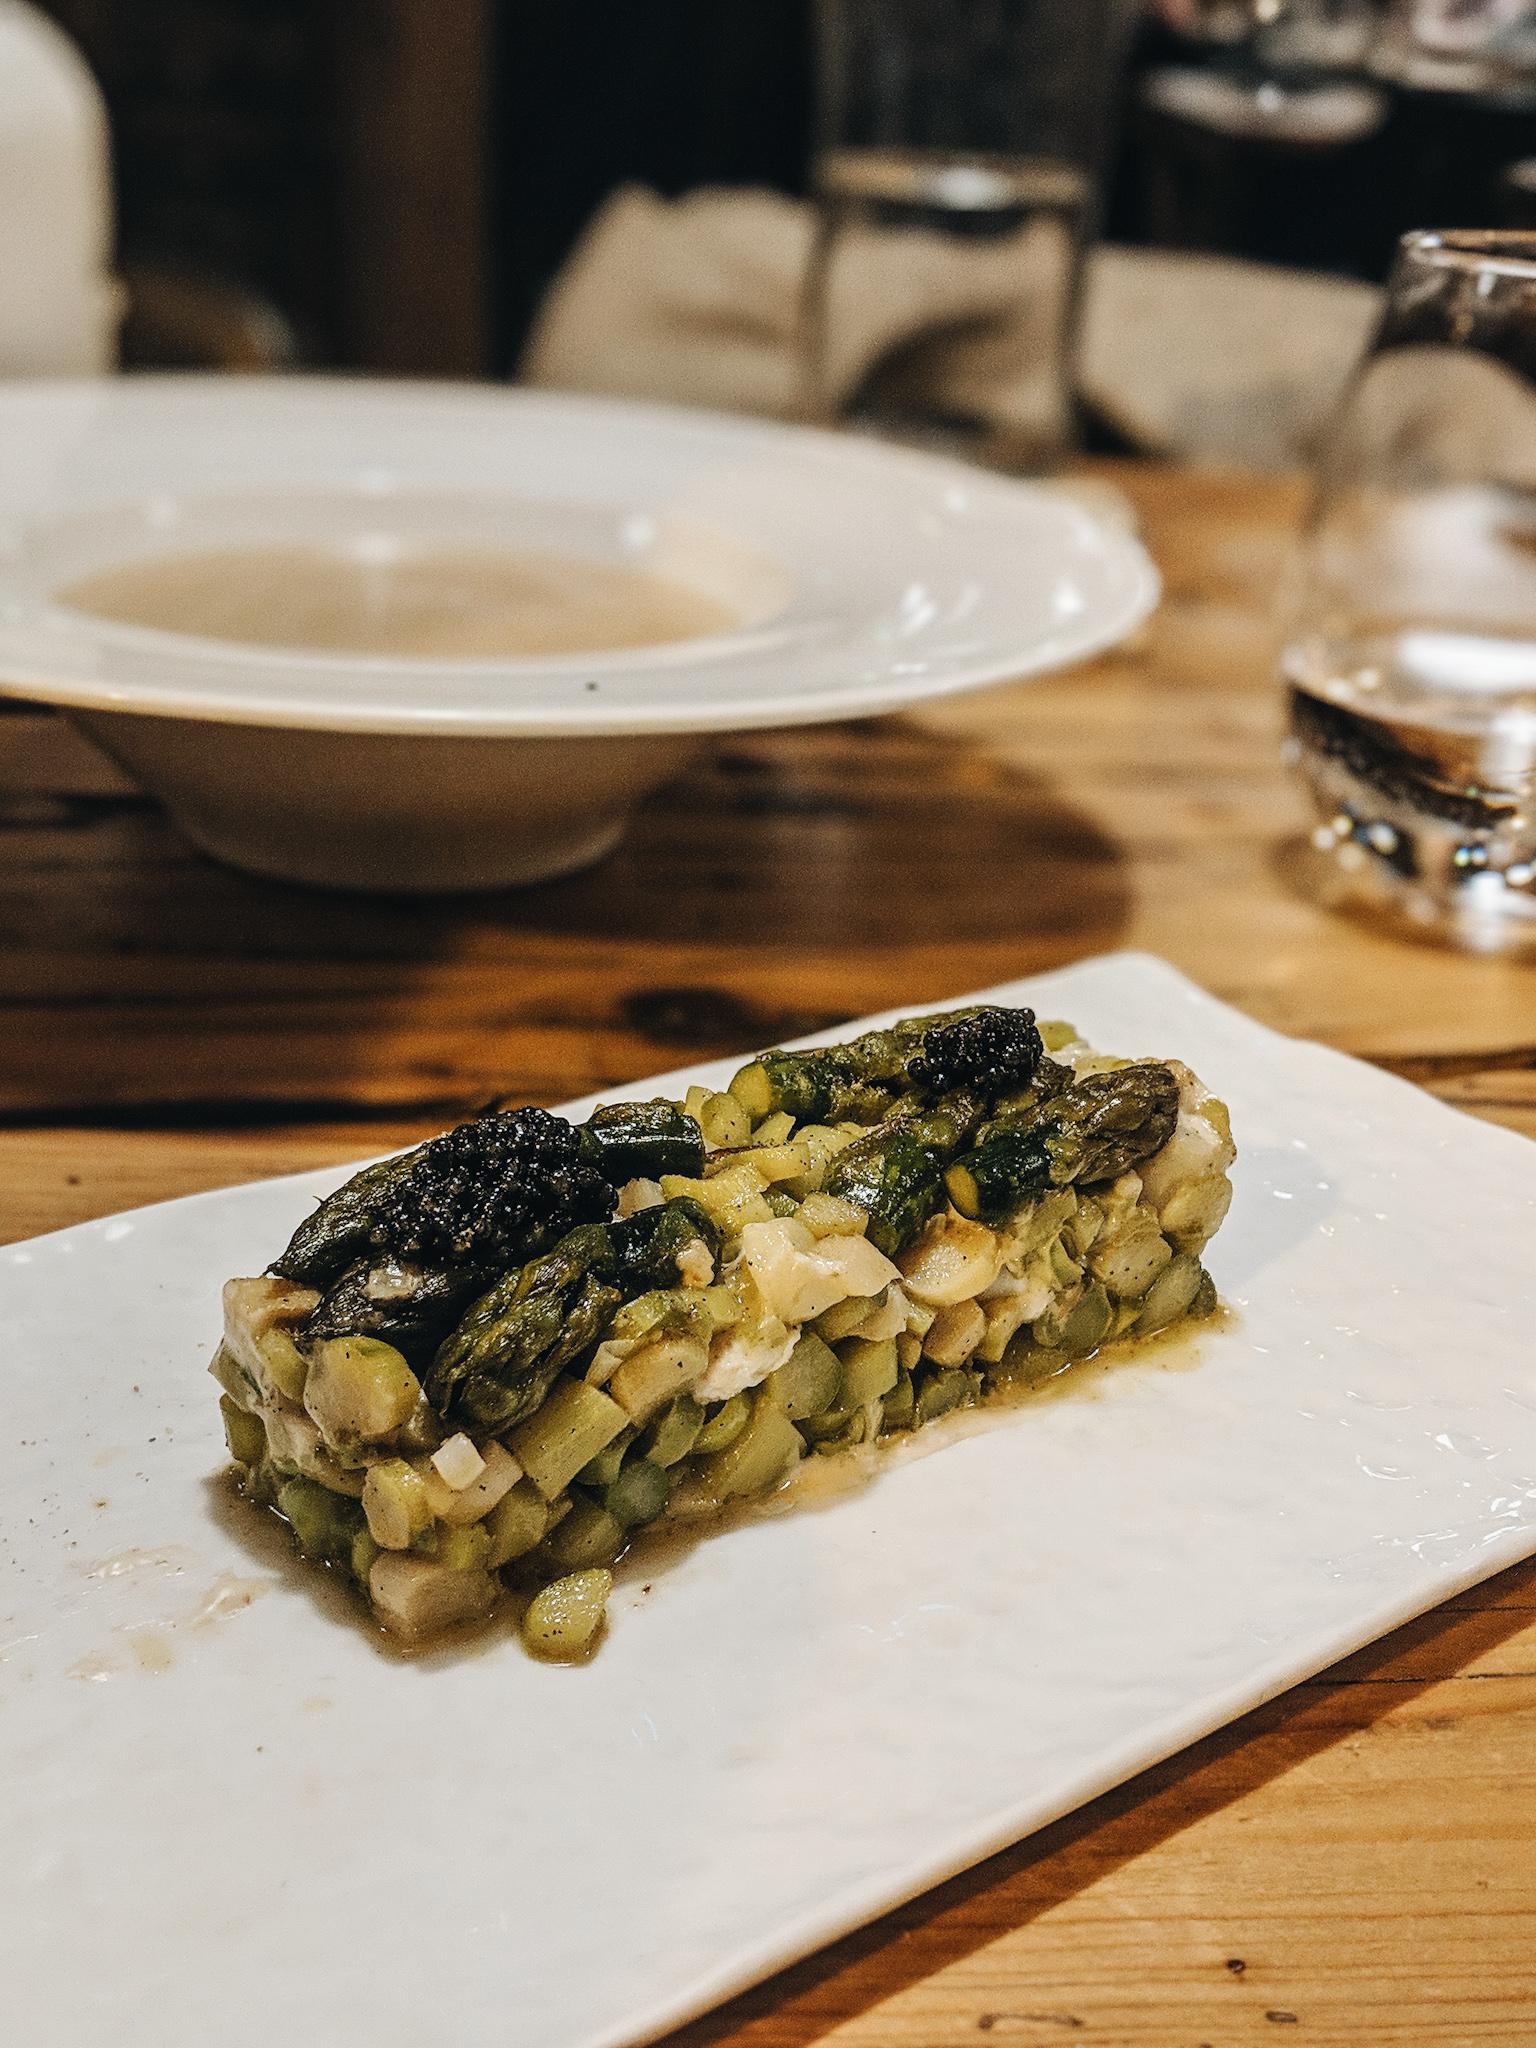 Grau Roig hotel's restaurant